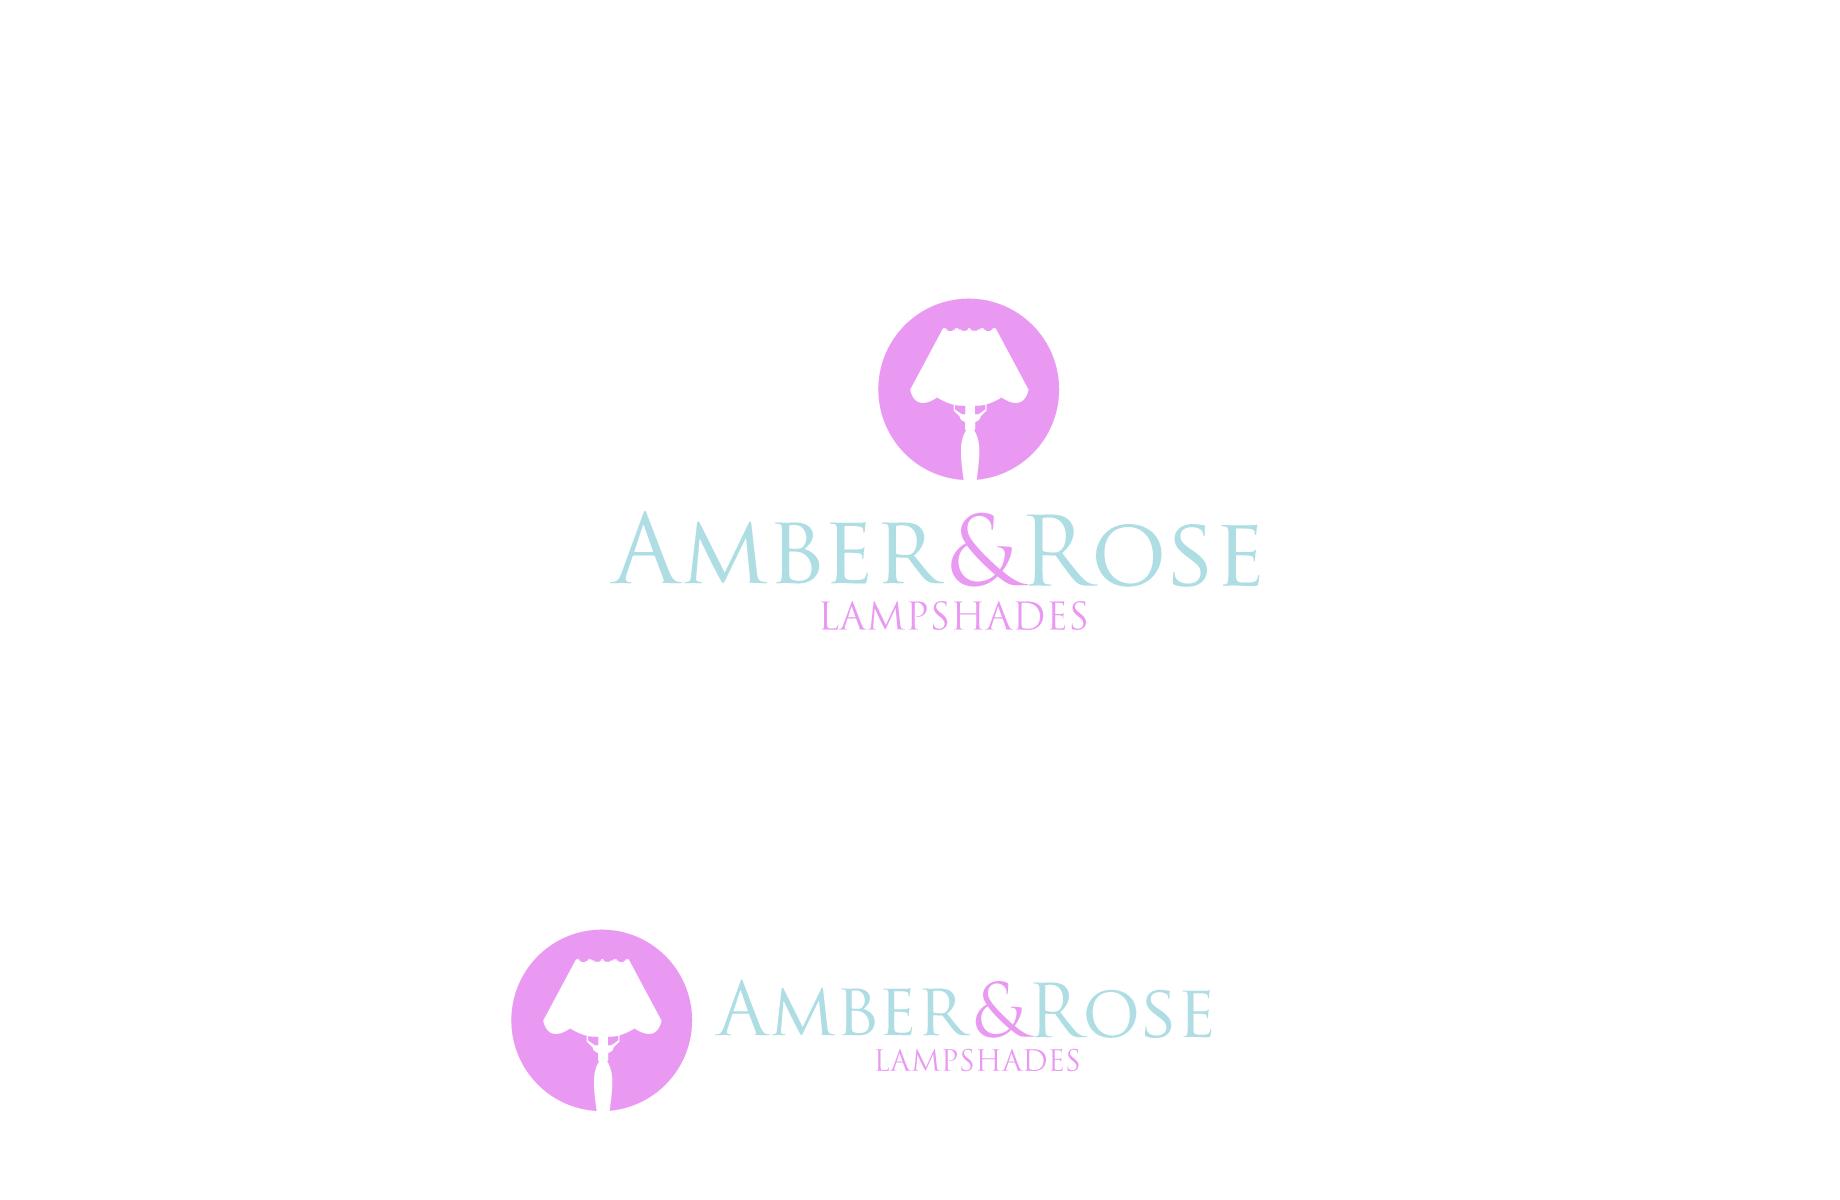 Logo Design by Jan Chua - Entry No. 26 in the Logo Design Contest Creative Logo Design for Amber & Rose.